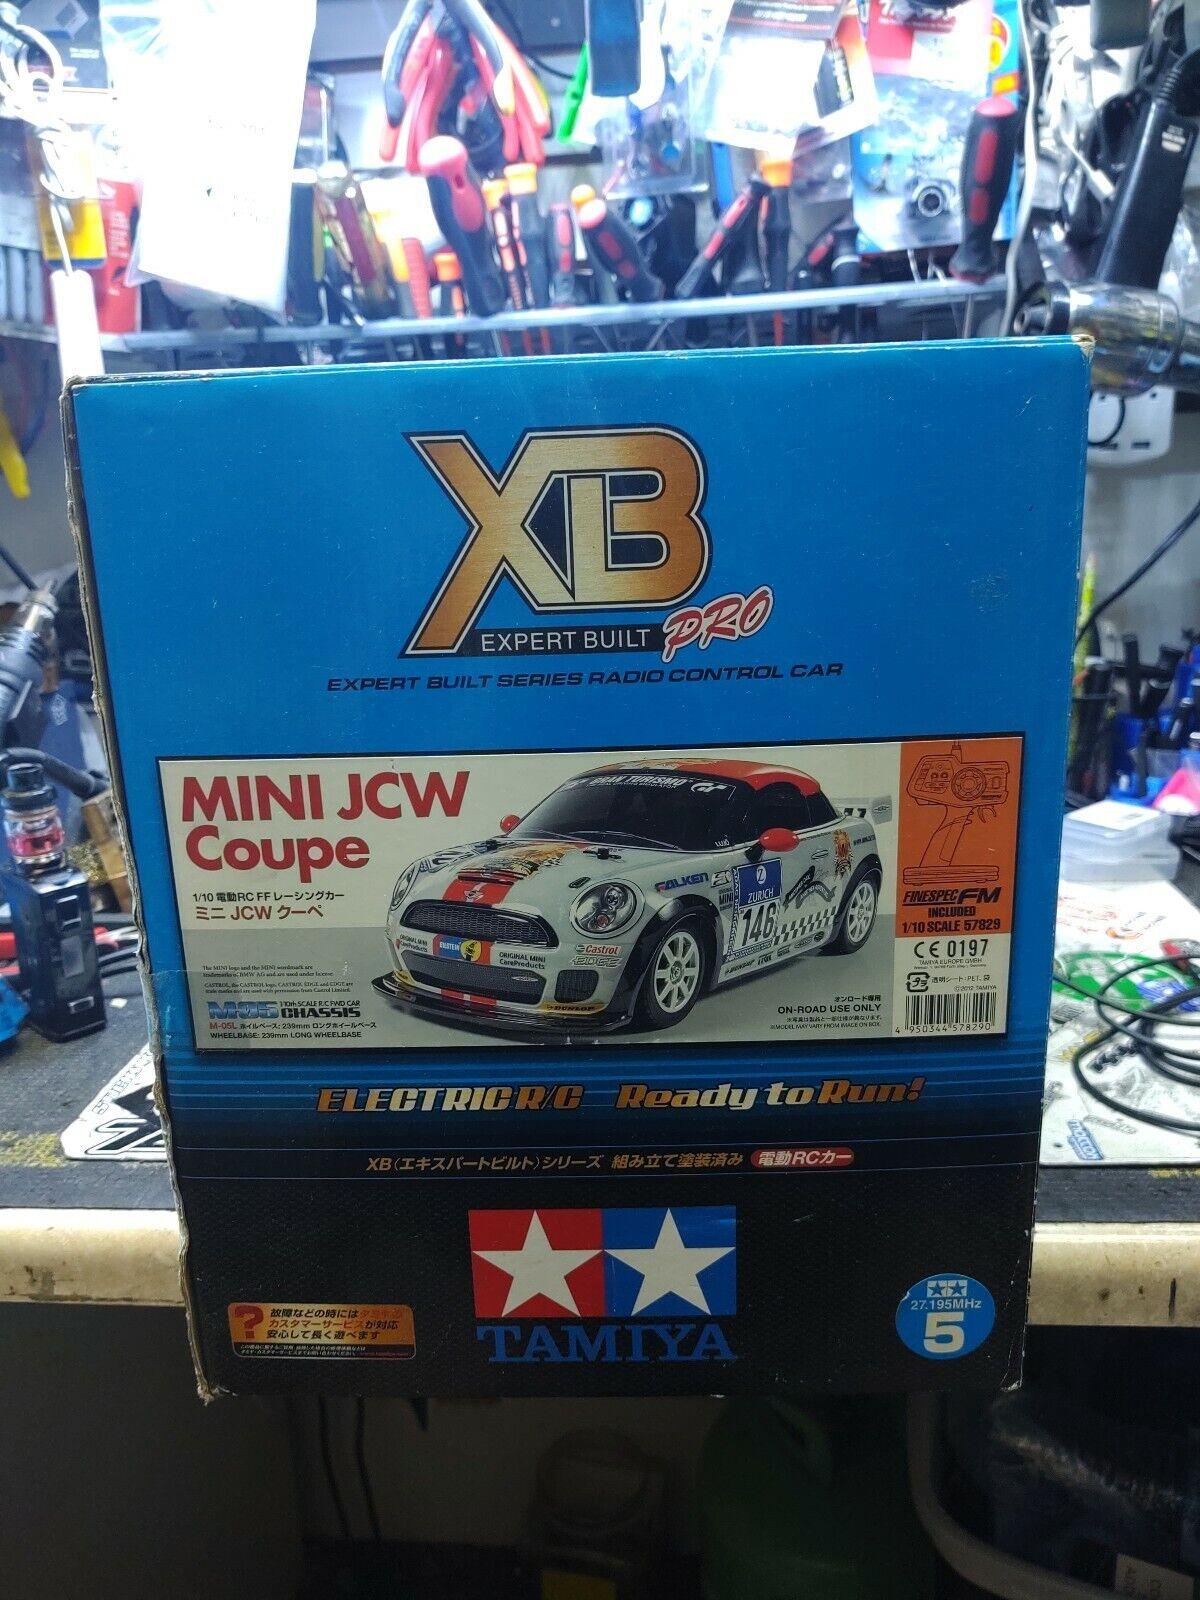 Tamiya 1:10 M-05 Mini JCW Coupe Screws and Small Parts SetT5M®